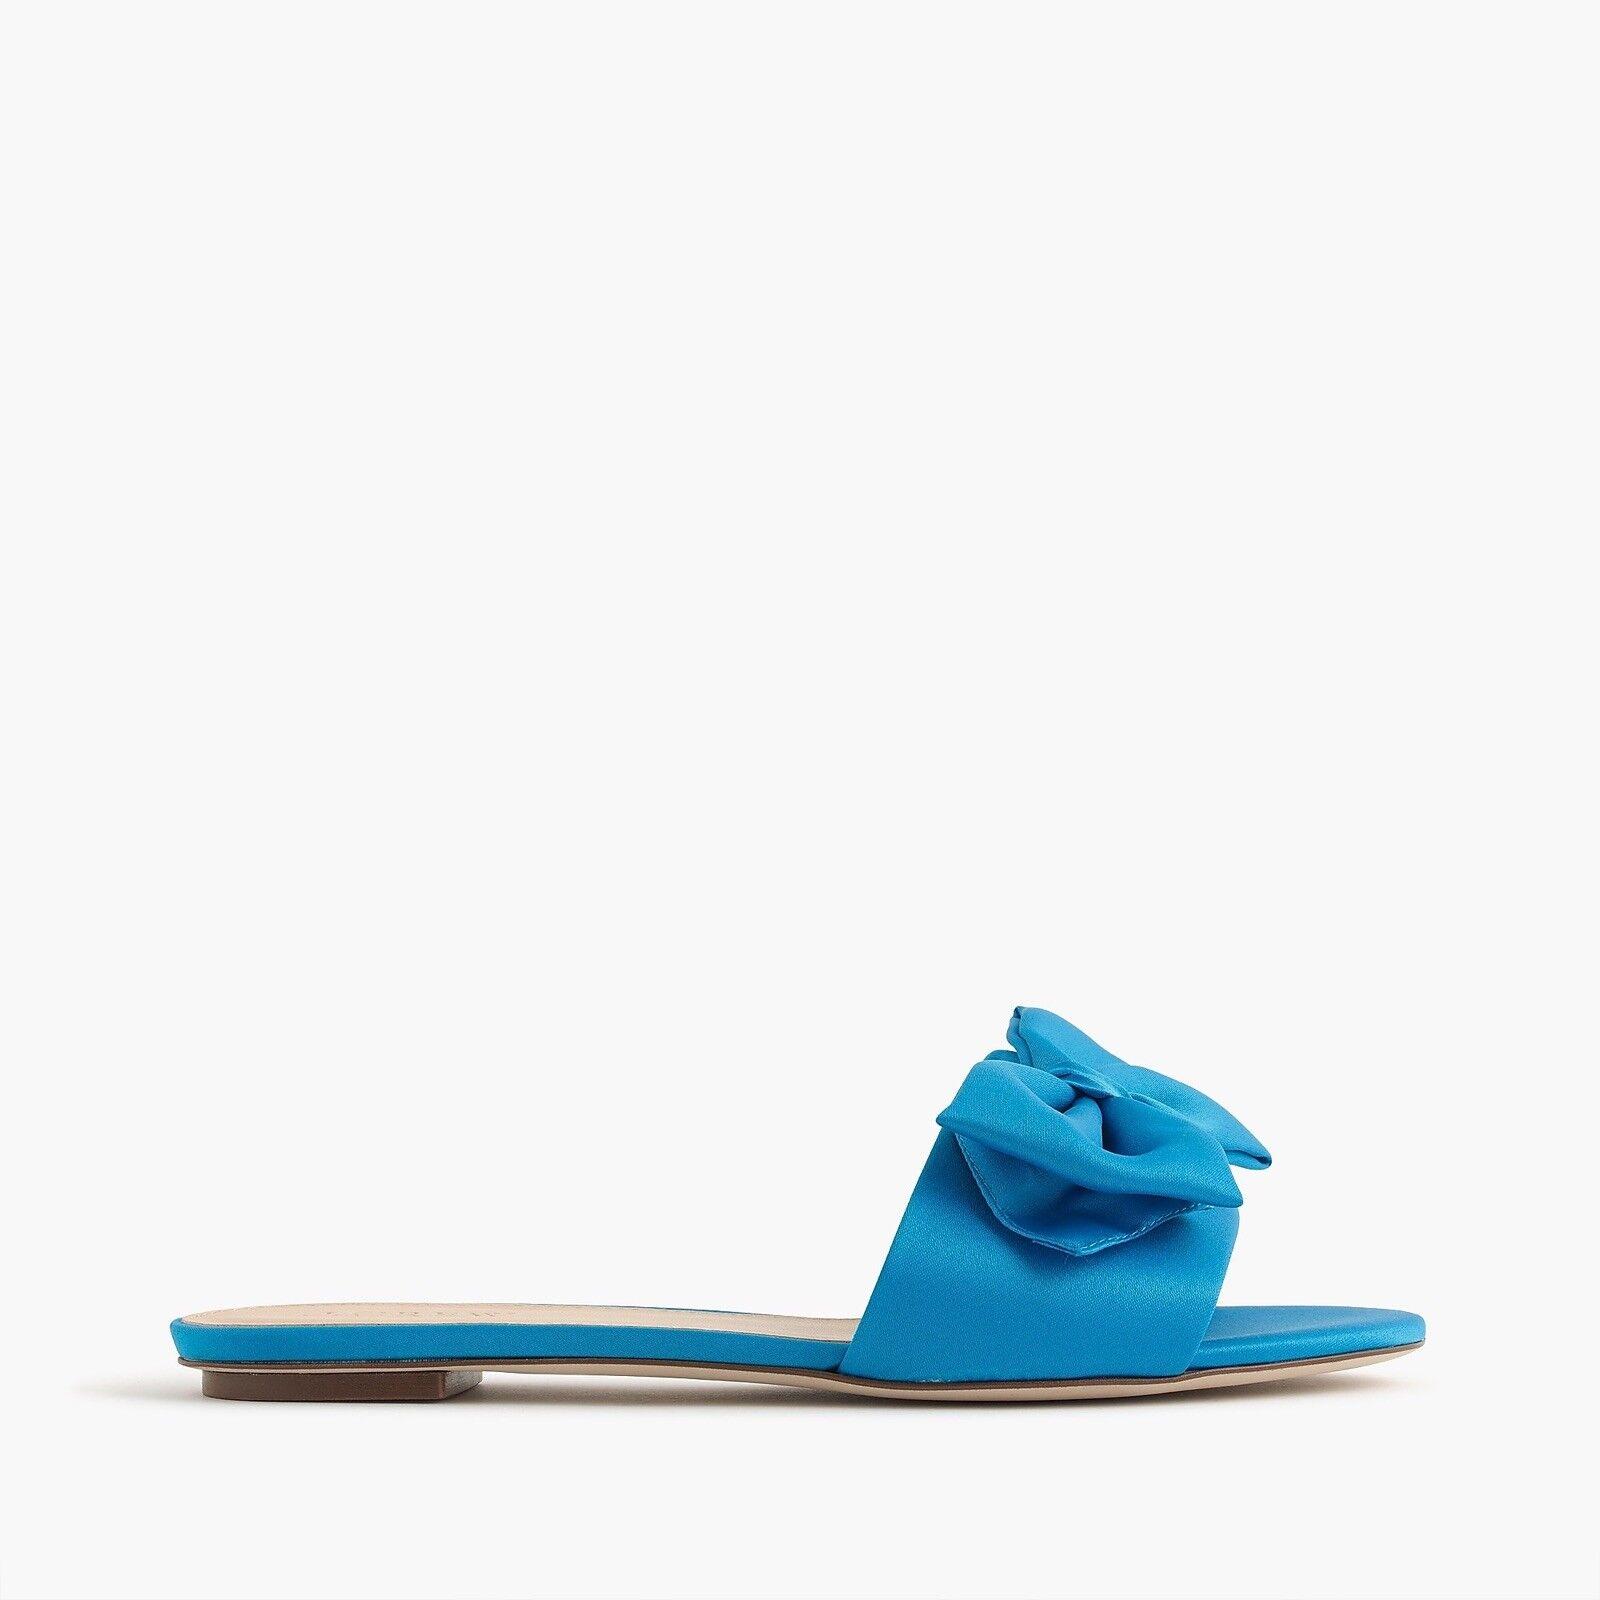 128 NUOVO J.CREW Satin sandali a slide con bow BRASILIAN blu Sz 5  presa di marca